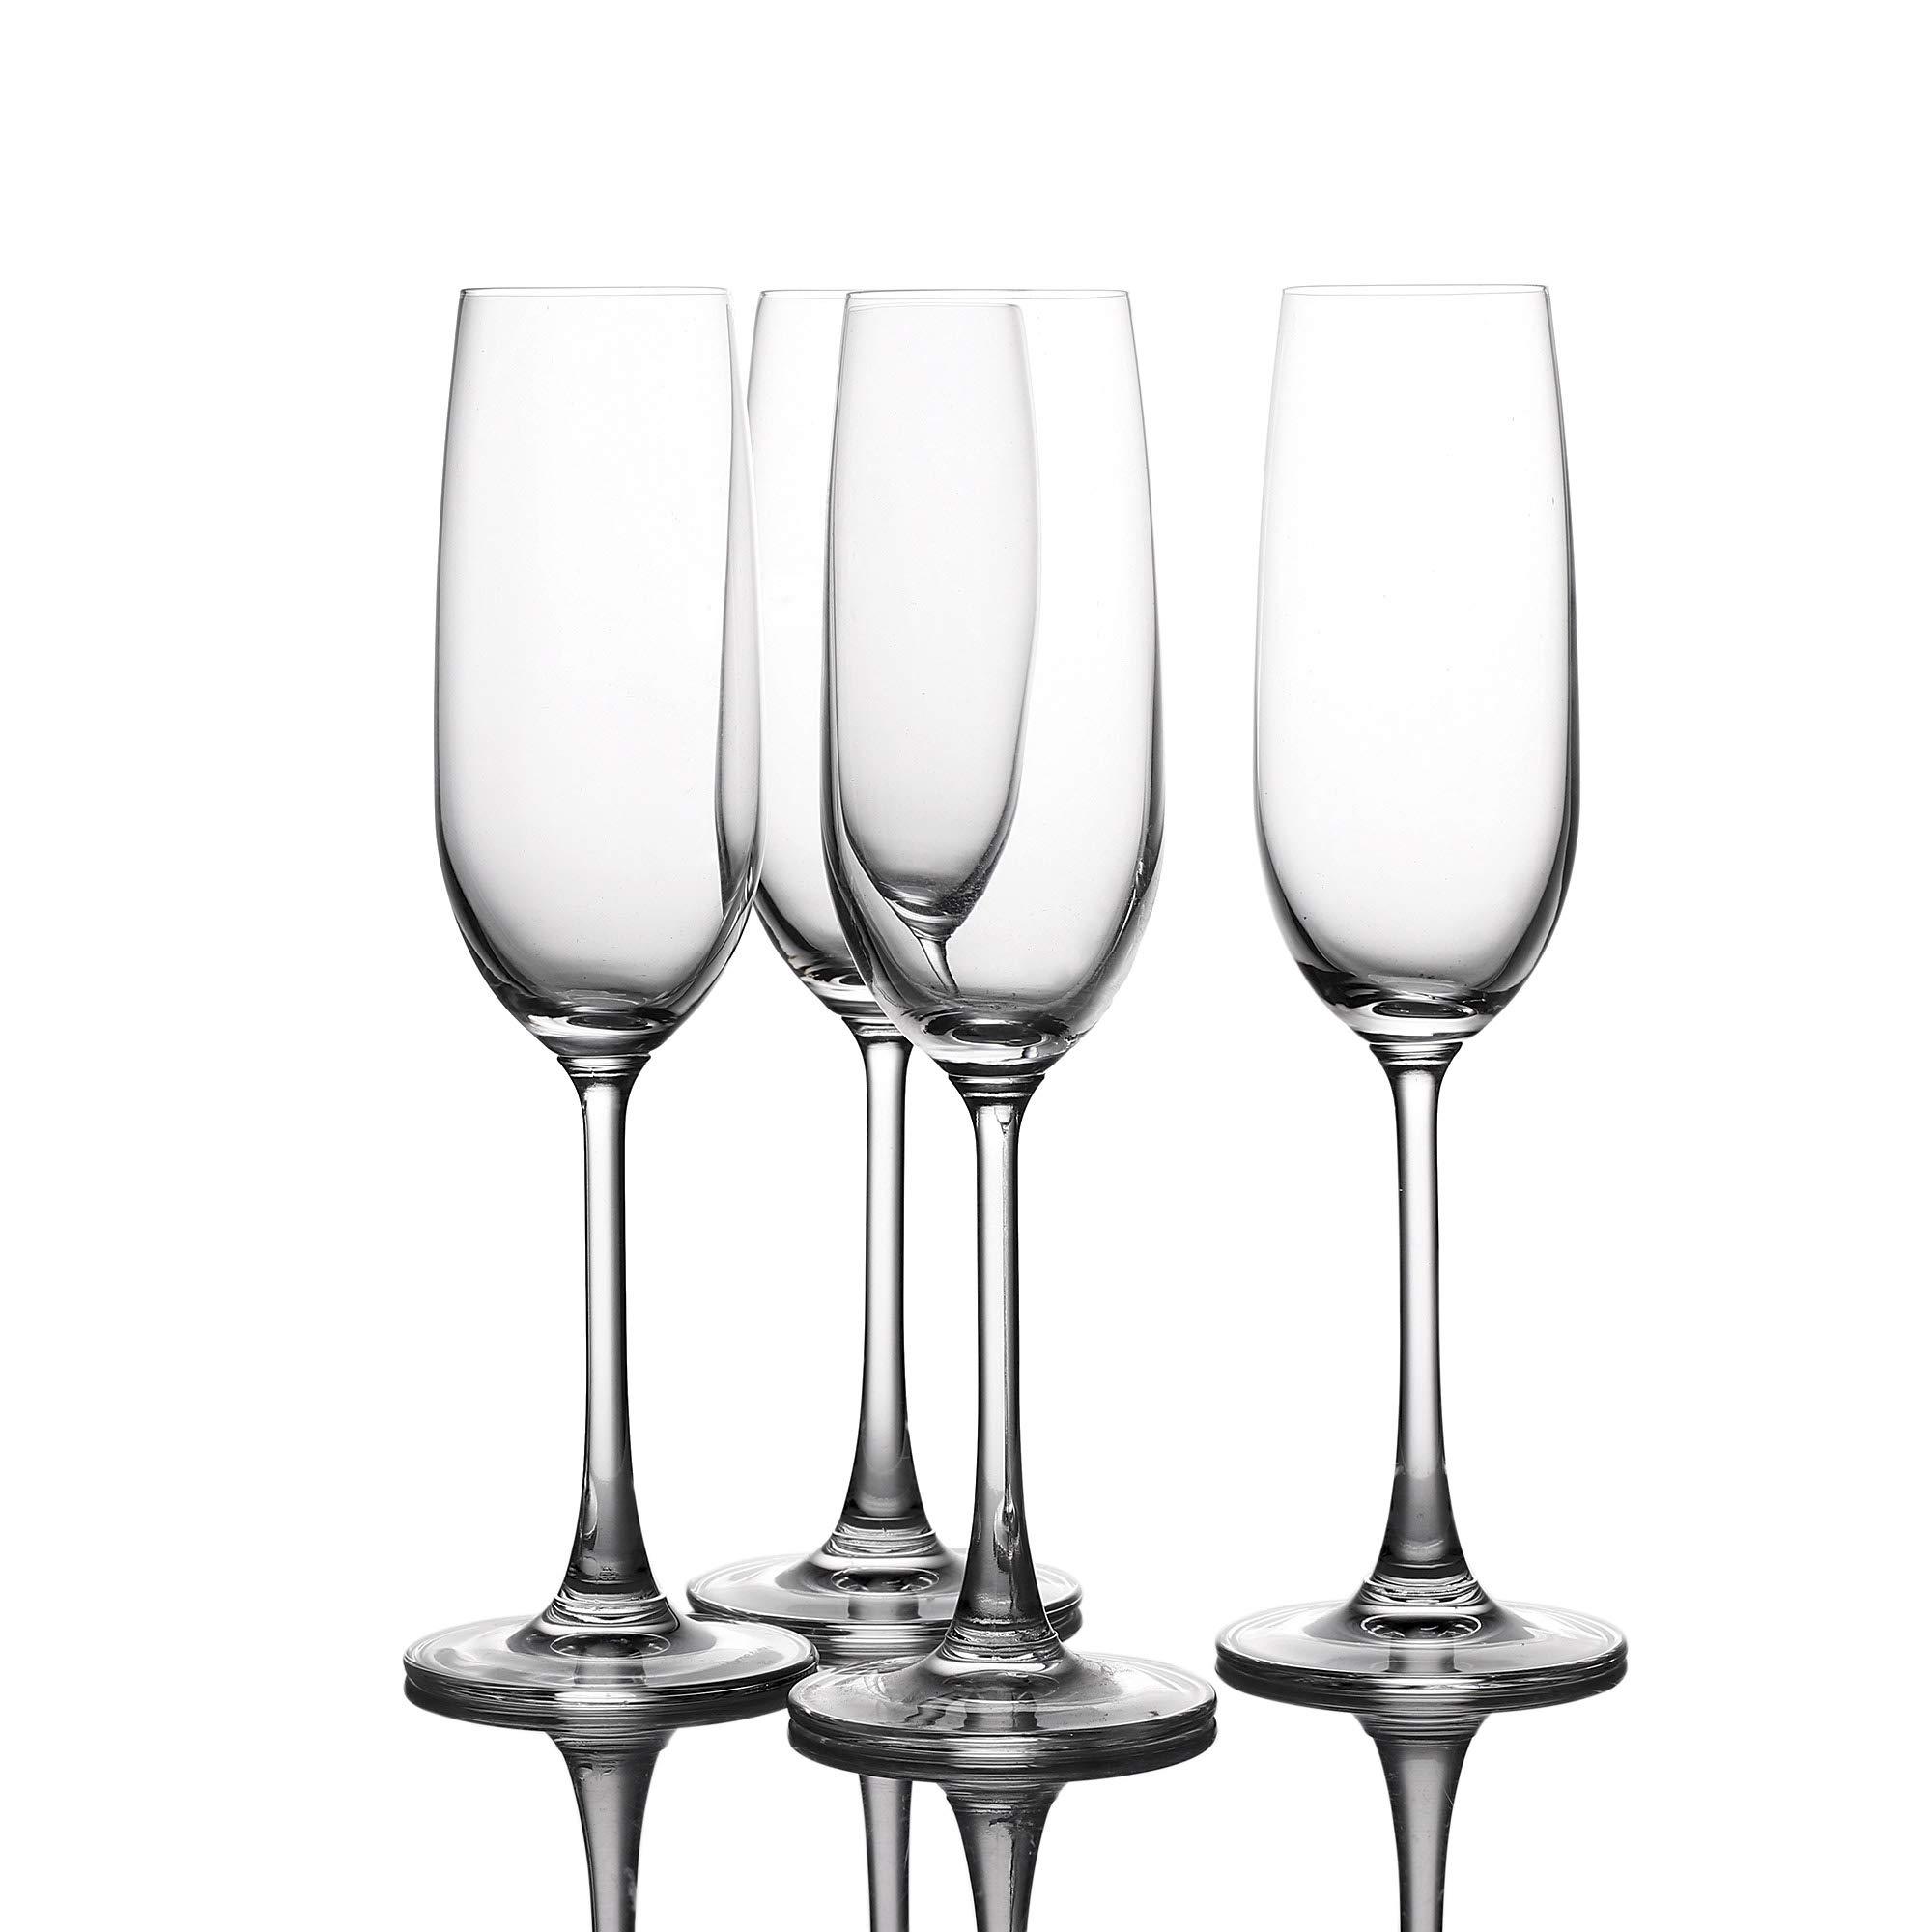 Crystal Champagne Flutes Glasses Set of 4 - Machine Made Glass 100% LEAD FREE 210ML/7FL OZ